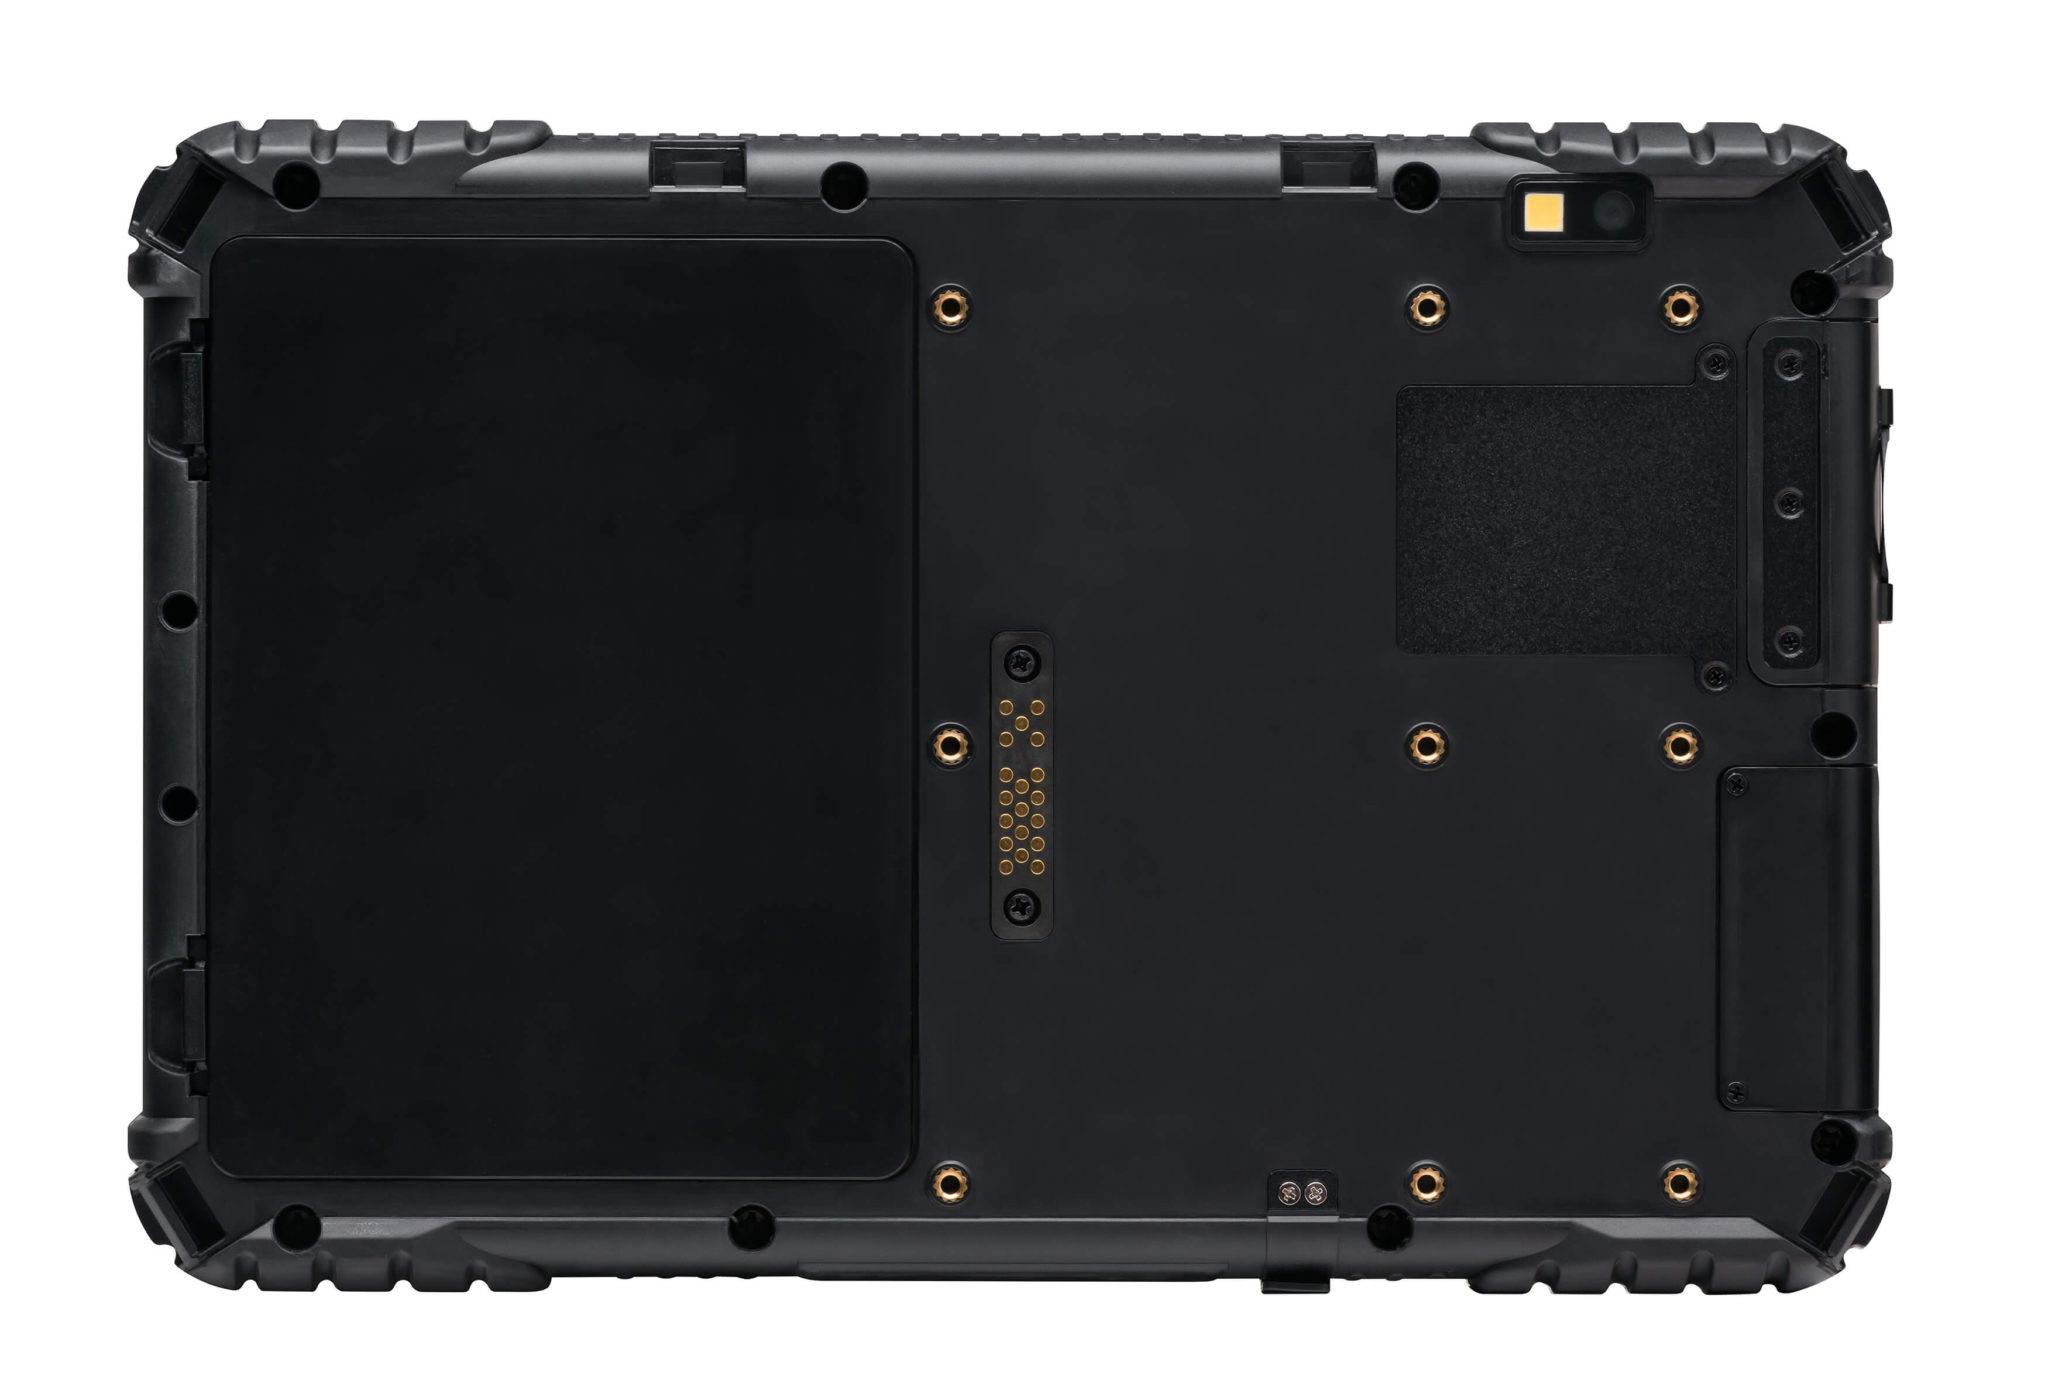 Algiz-8X-rugged-tablet-backview(1)